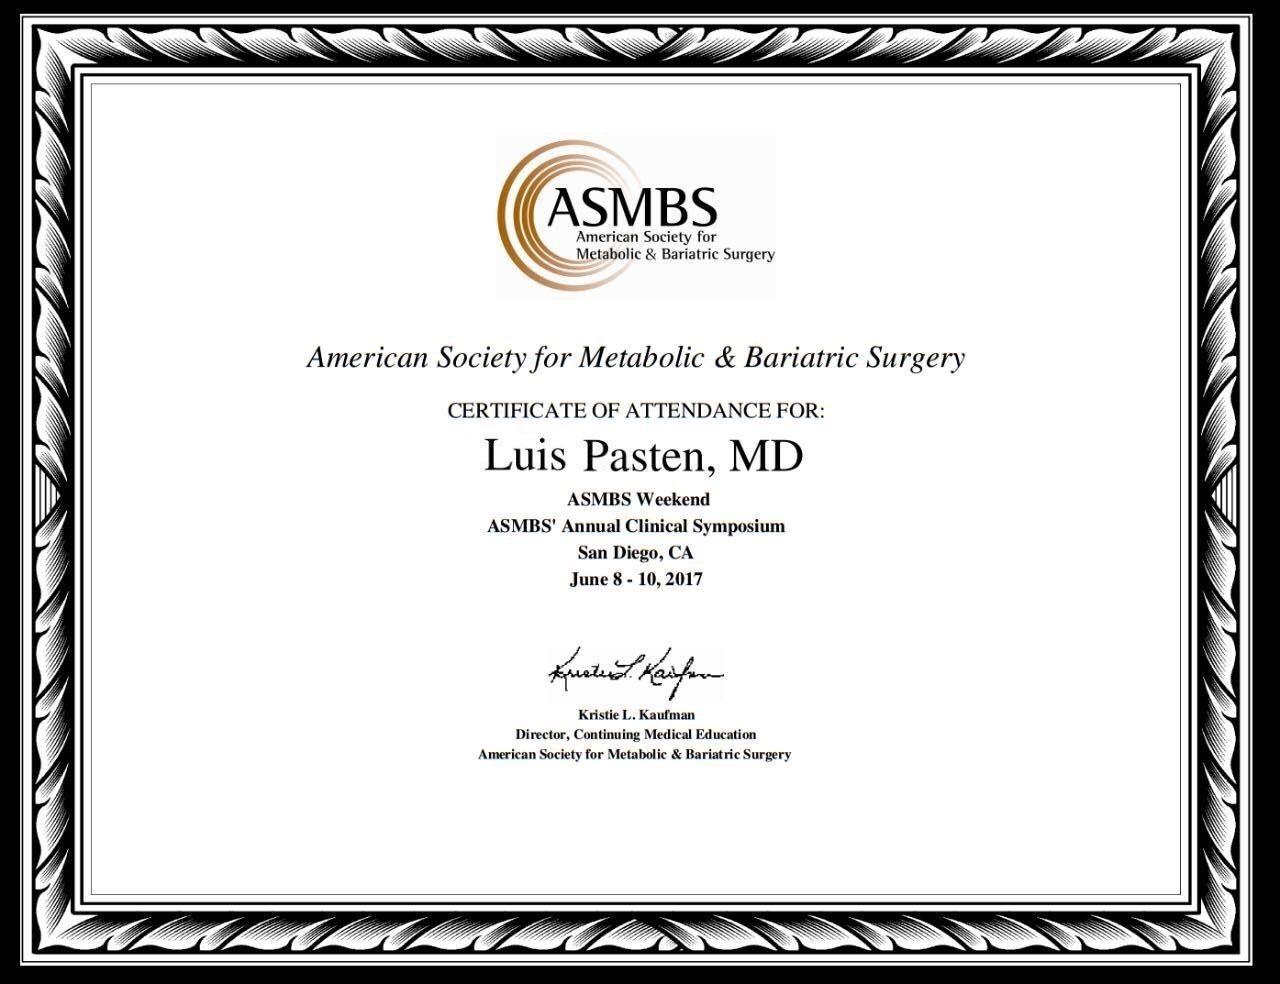 Dr. Luis Pasten